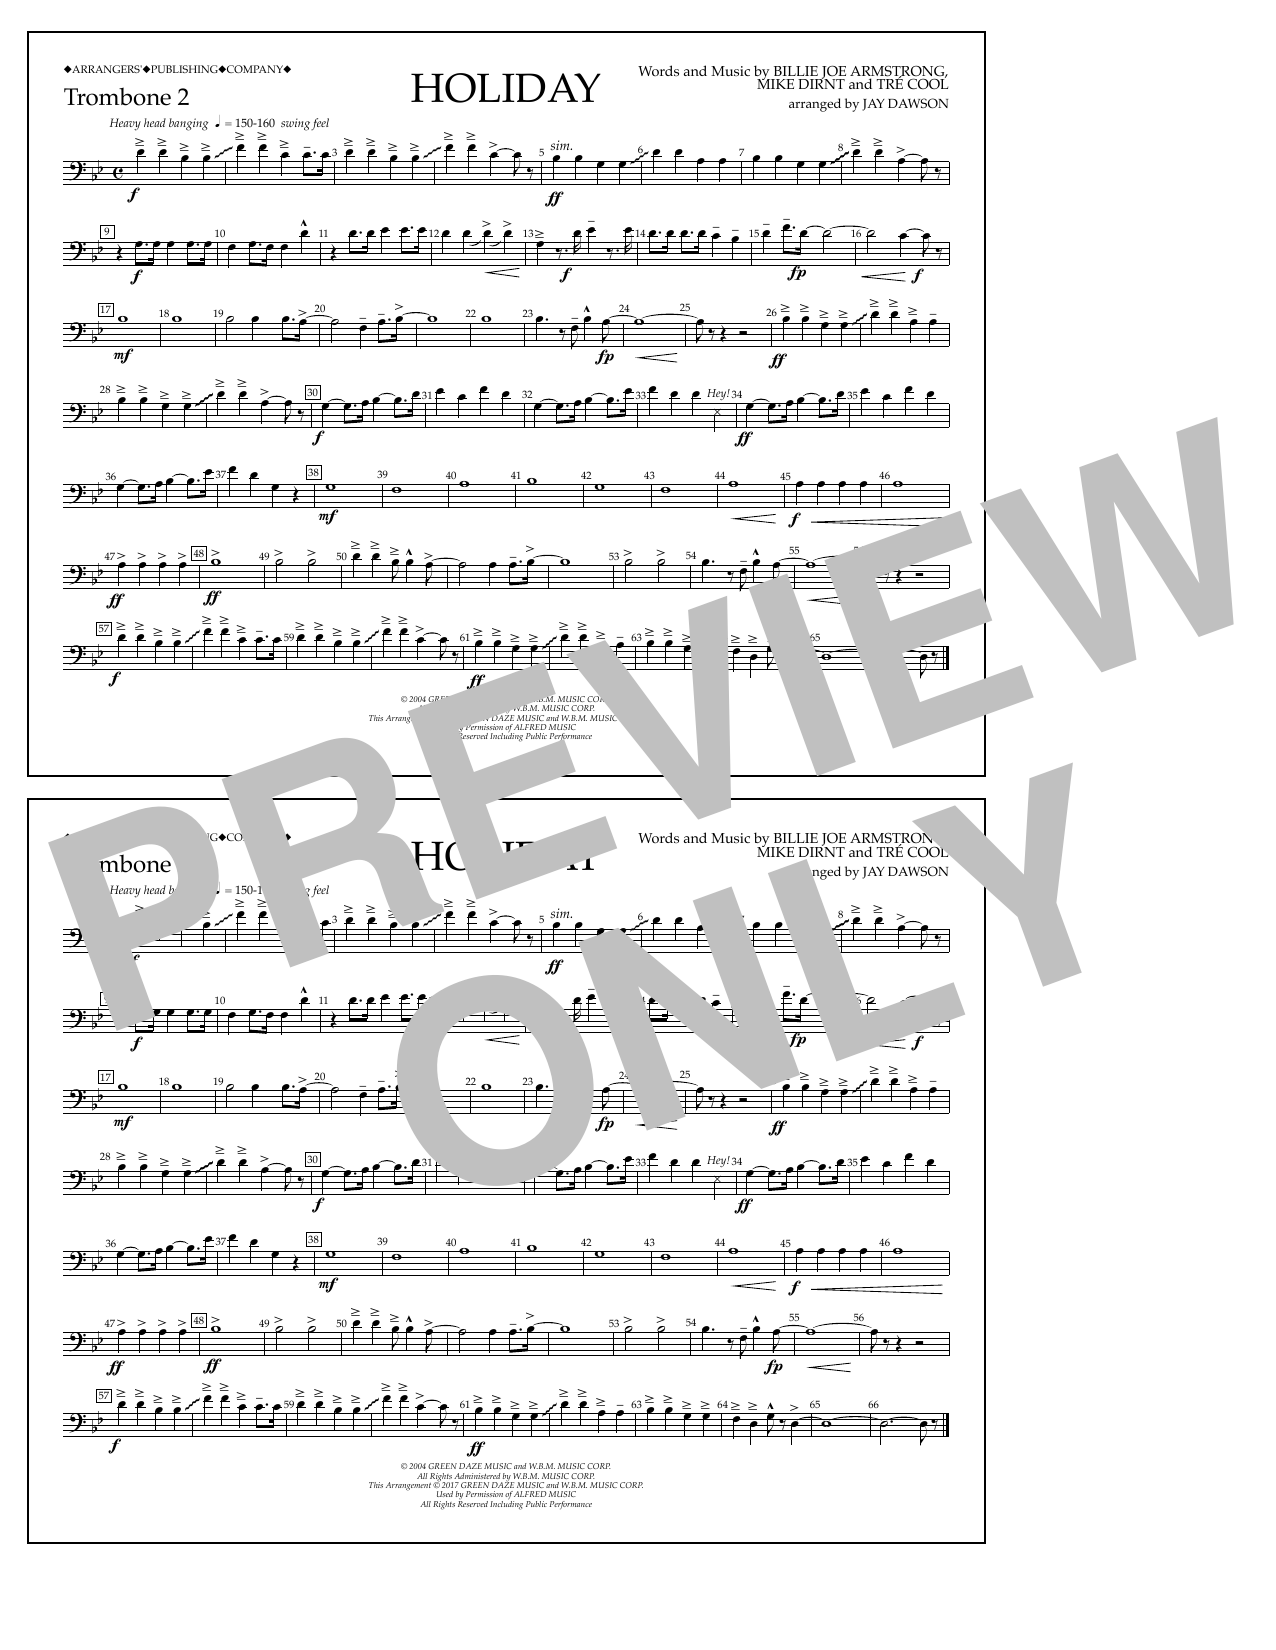 Holiday - Trombone 2 Sheet Music